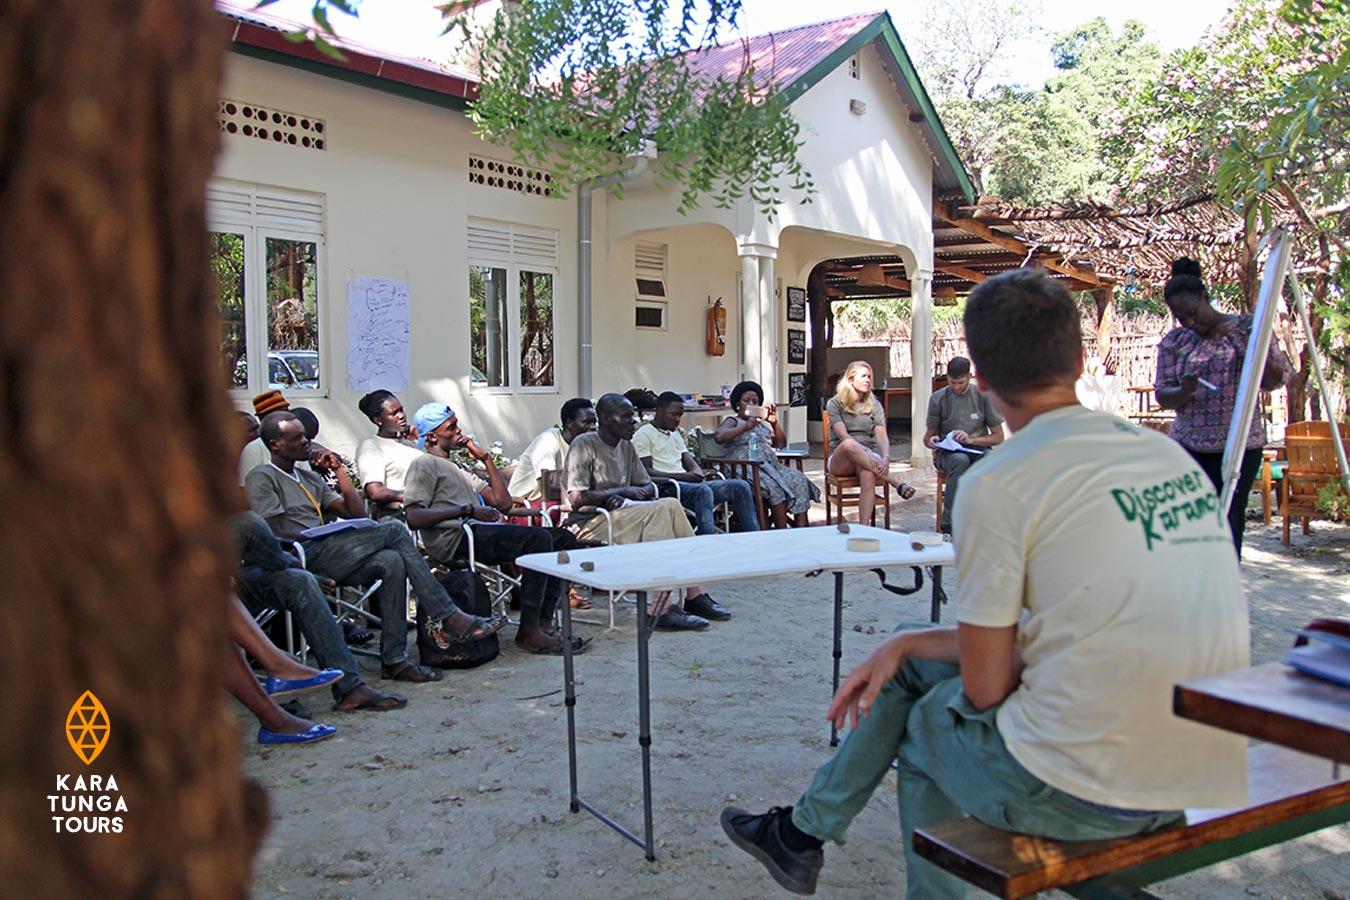 kara-tunga-undp-usaga-uwa-karamoja-uganda-tour-guides-moroto-training-2